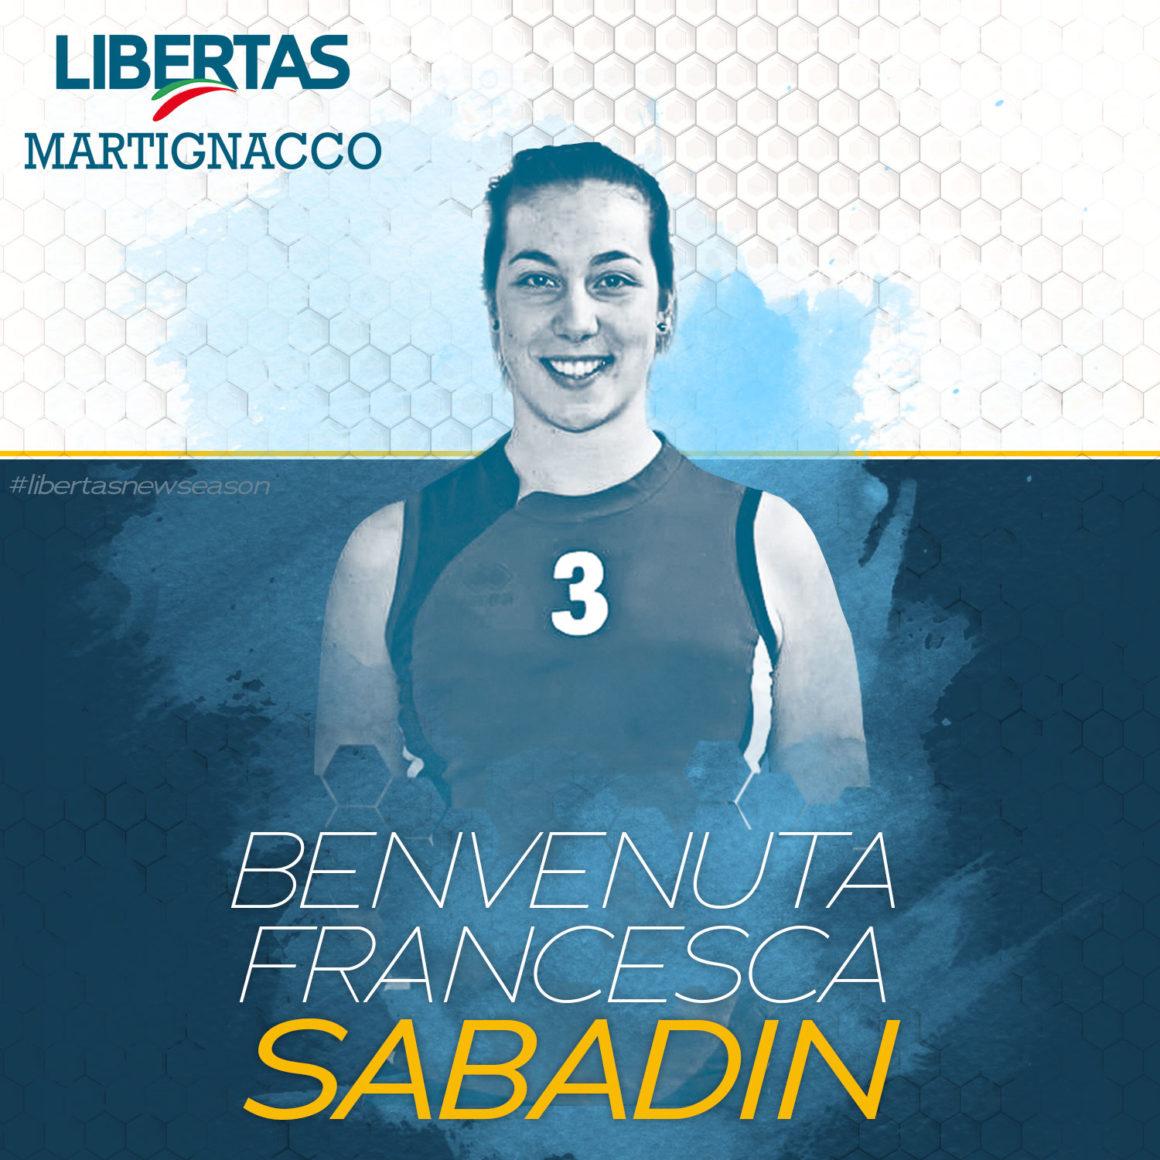 Ecco l'altra palleggiatrice: Francesca Sabadin!